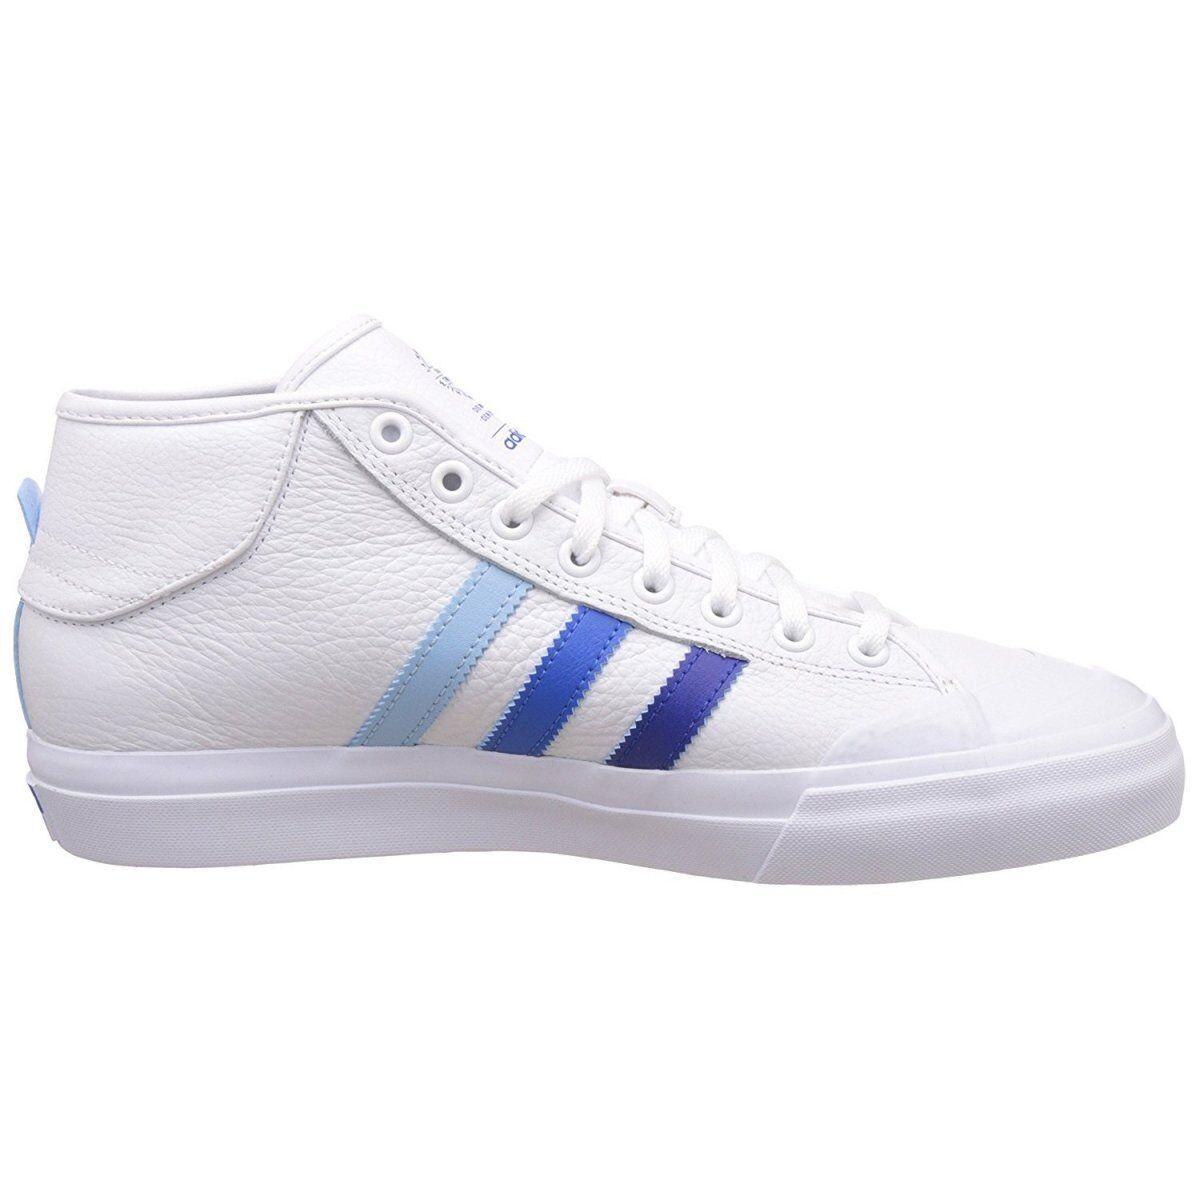 ADIDAS ORIGINALS MATCHCOURT MID Hombre B72895 skateboarding Zapatos  zapatillas B72895 Hombre 32d839